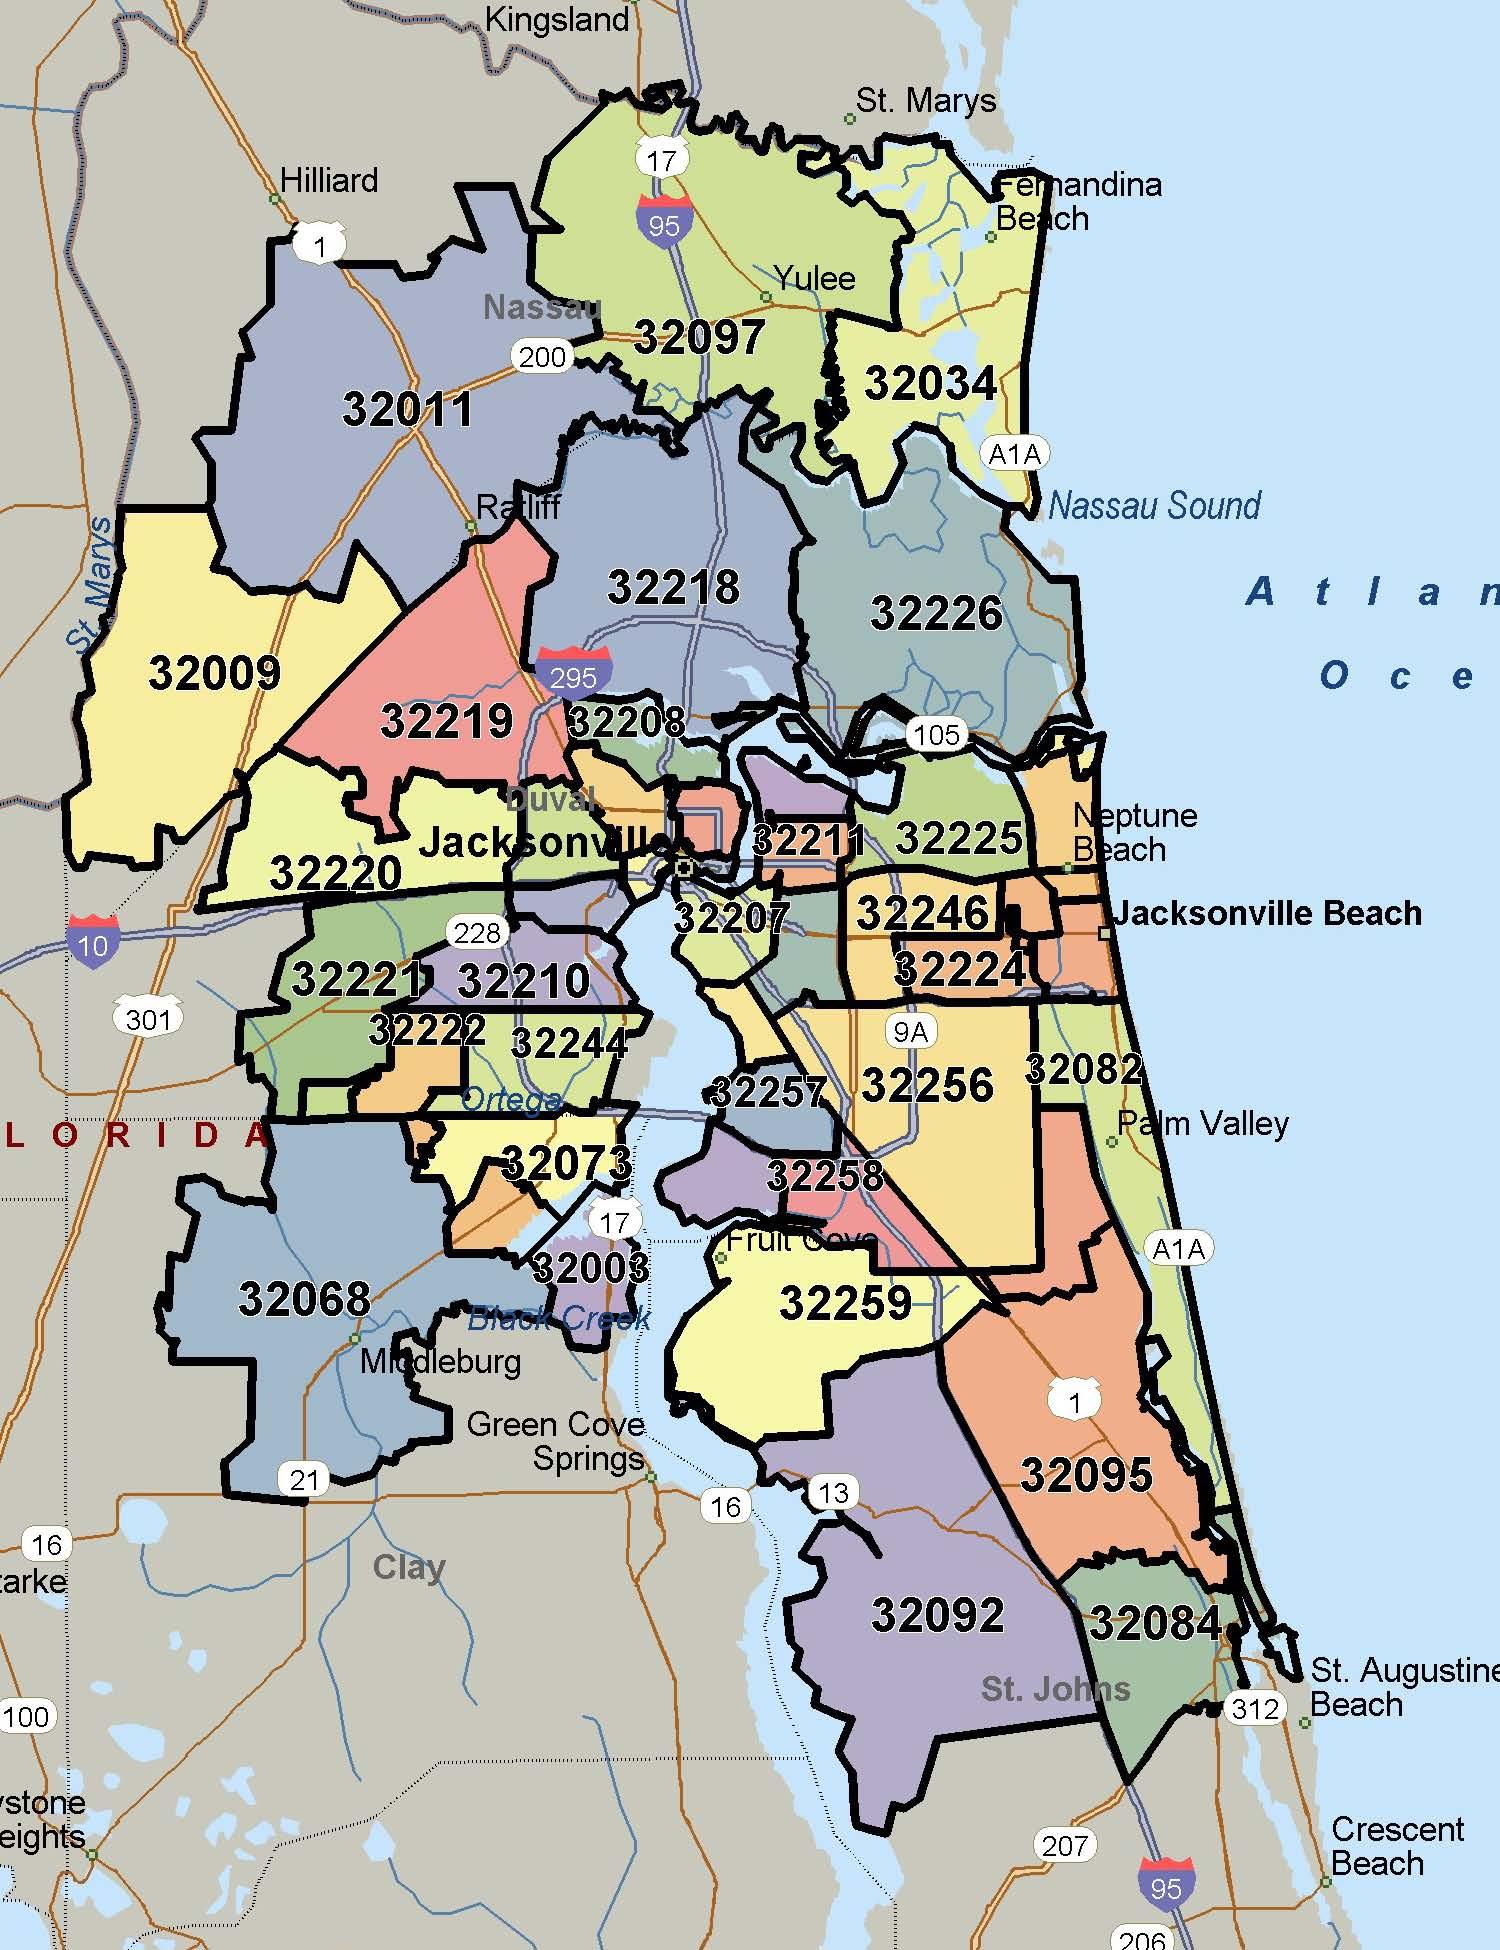 North Florida Zip Code Map And Travel Information   Download Free - Florida North Map